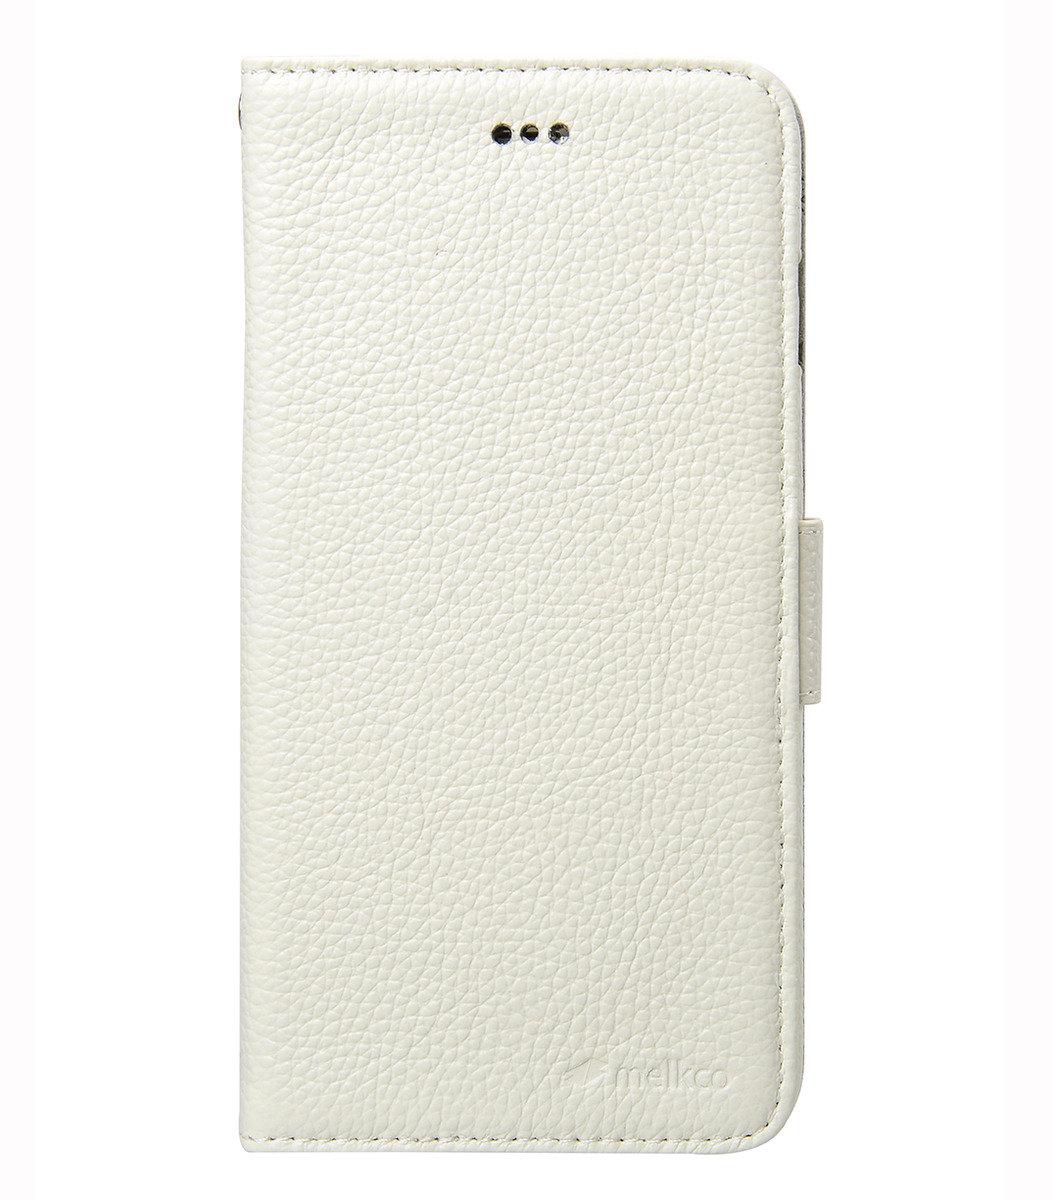 "iPhone 6 Plus/6S Plus (5.5"") Wallet Book Type 高級真皮手機套 - 白色荔枝紋"